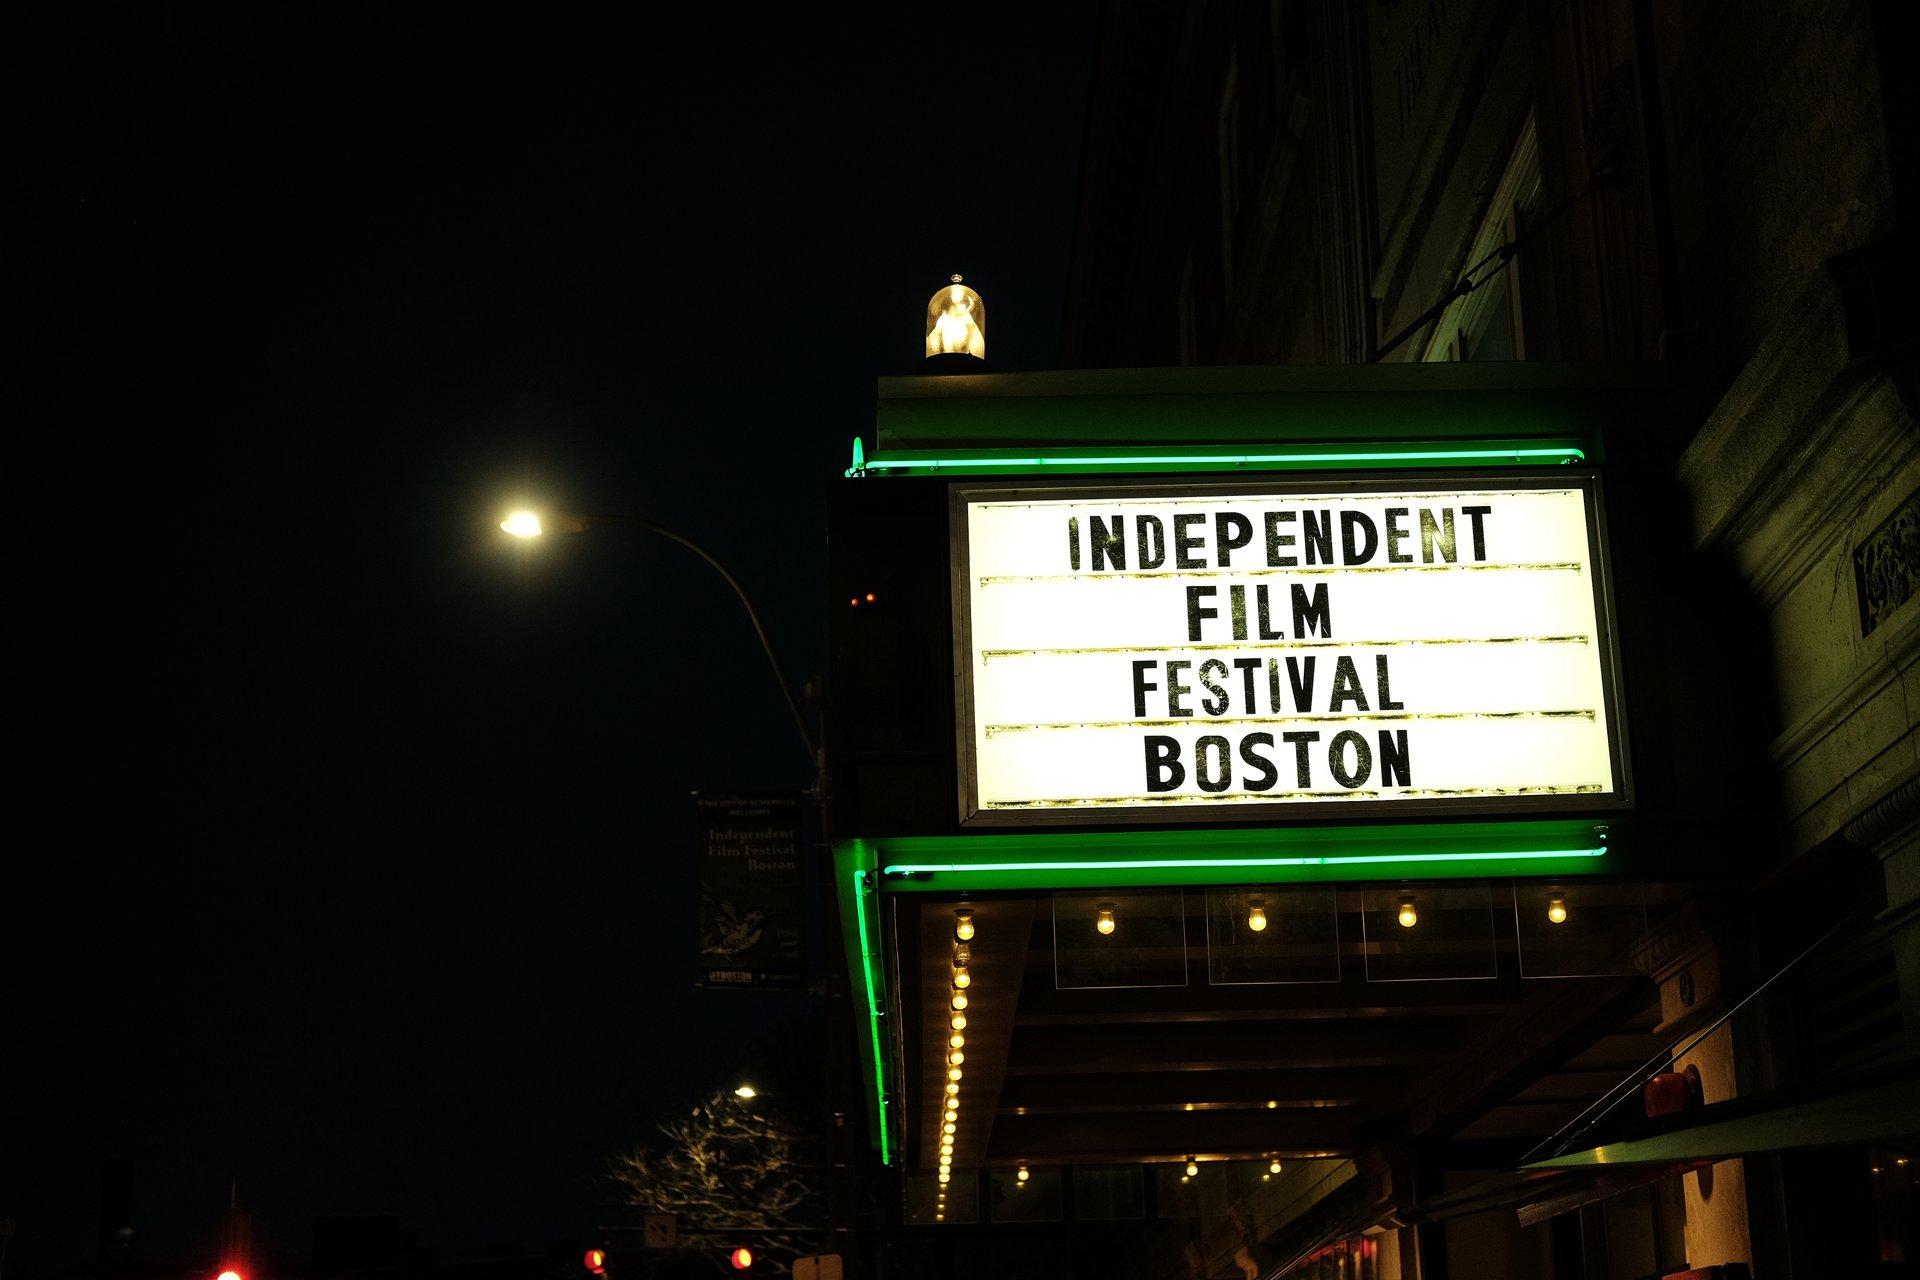 Independent Film Festival Boston (IFFBoston) in Boston - Best Season 2020